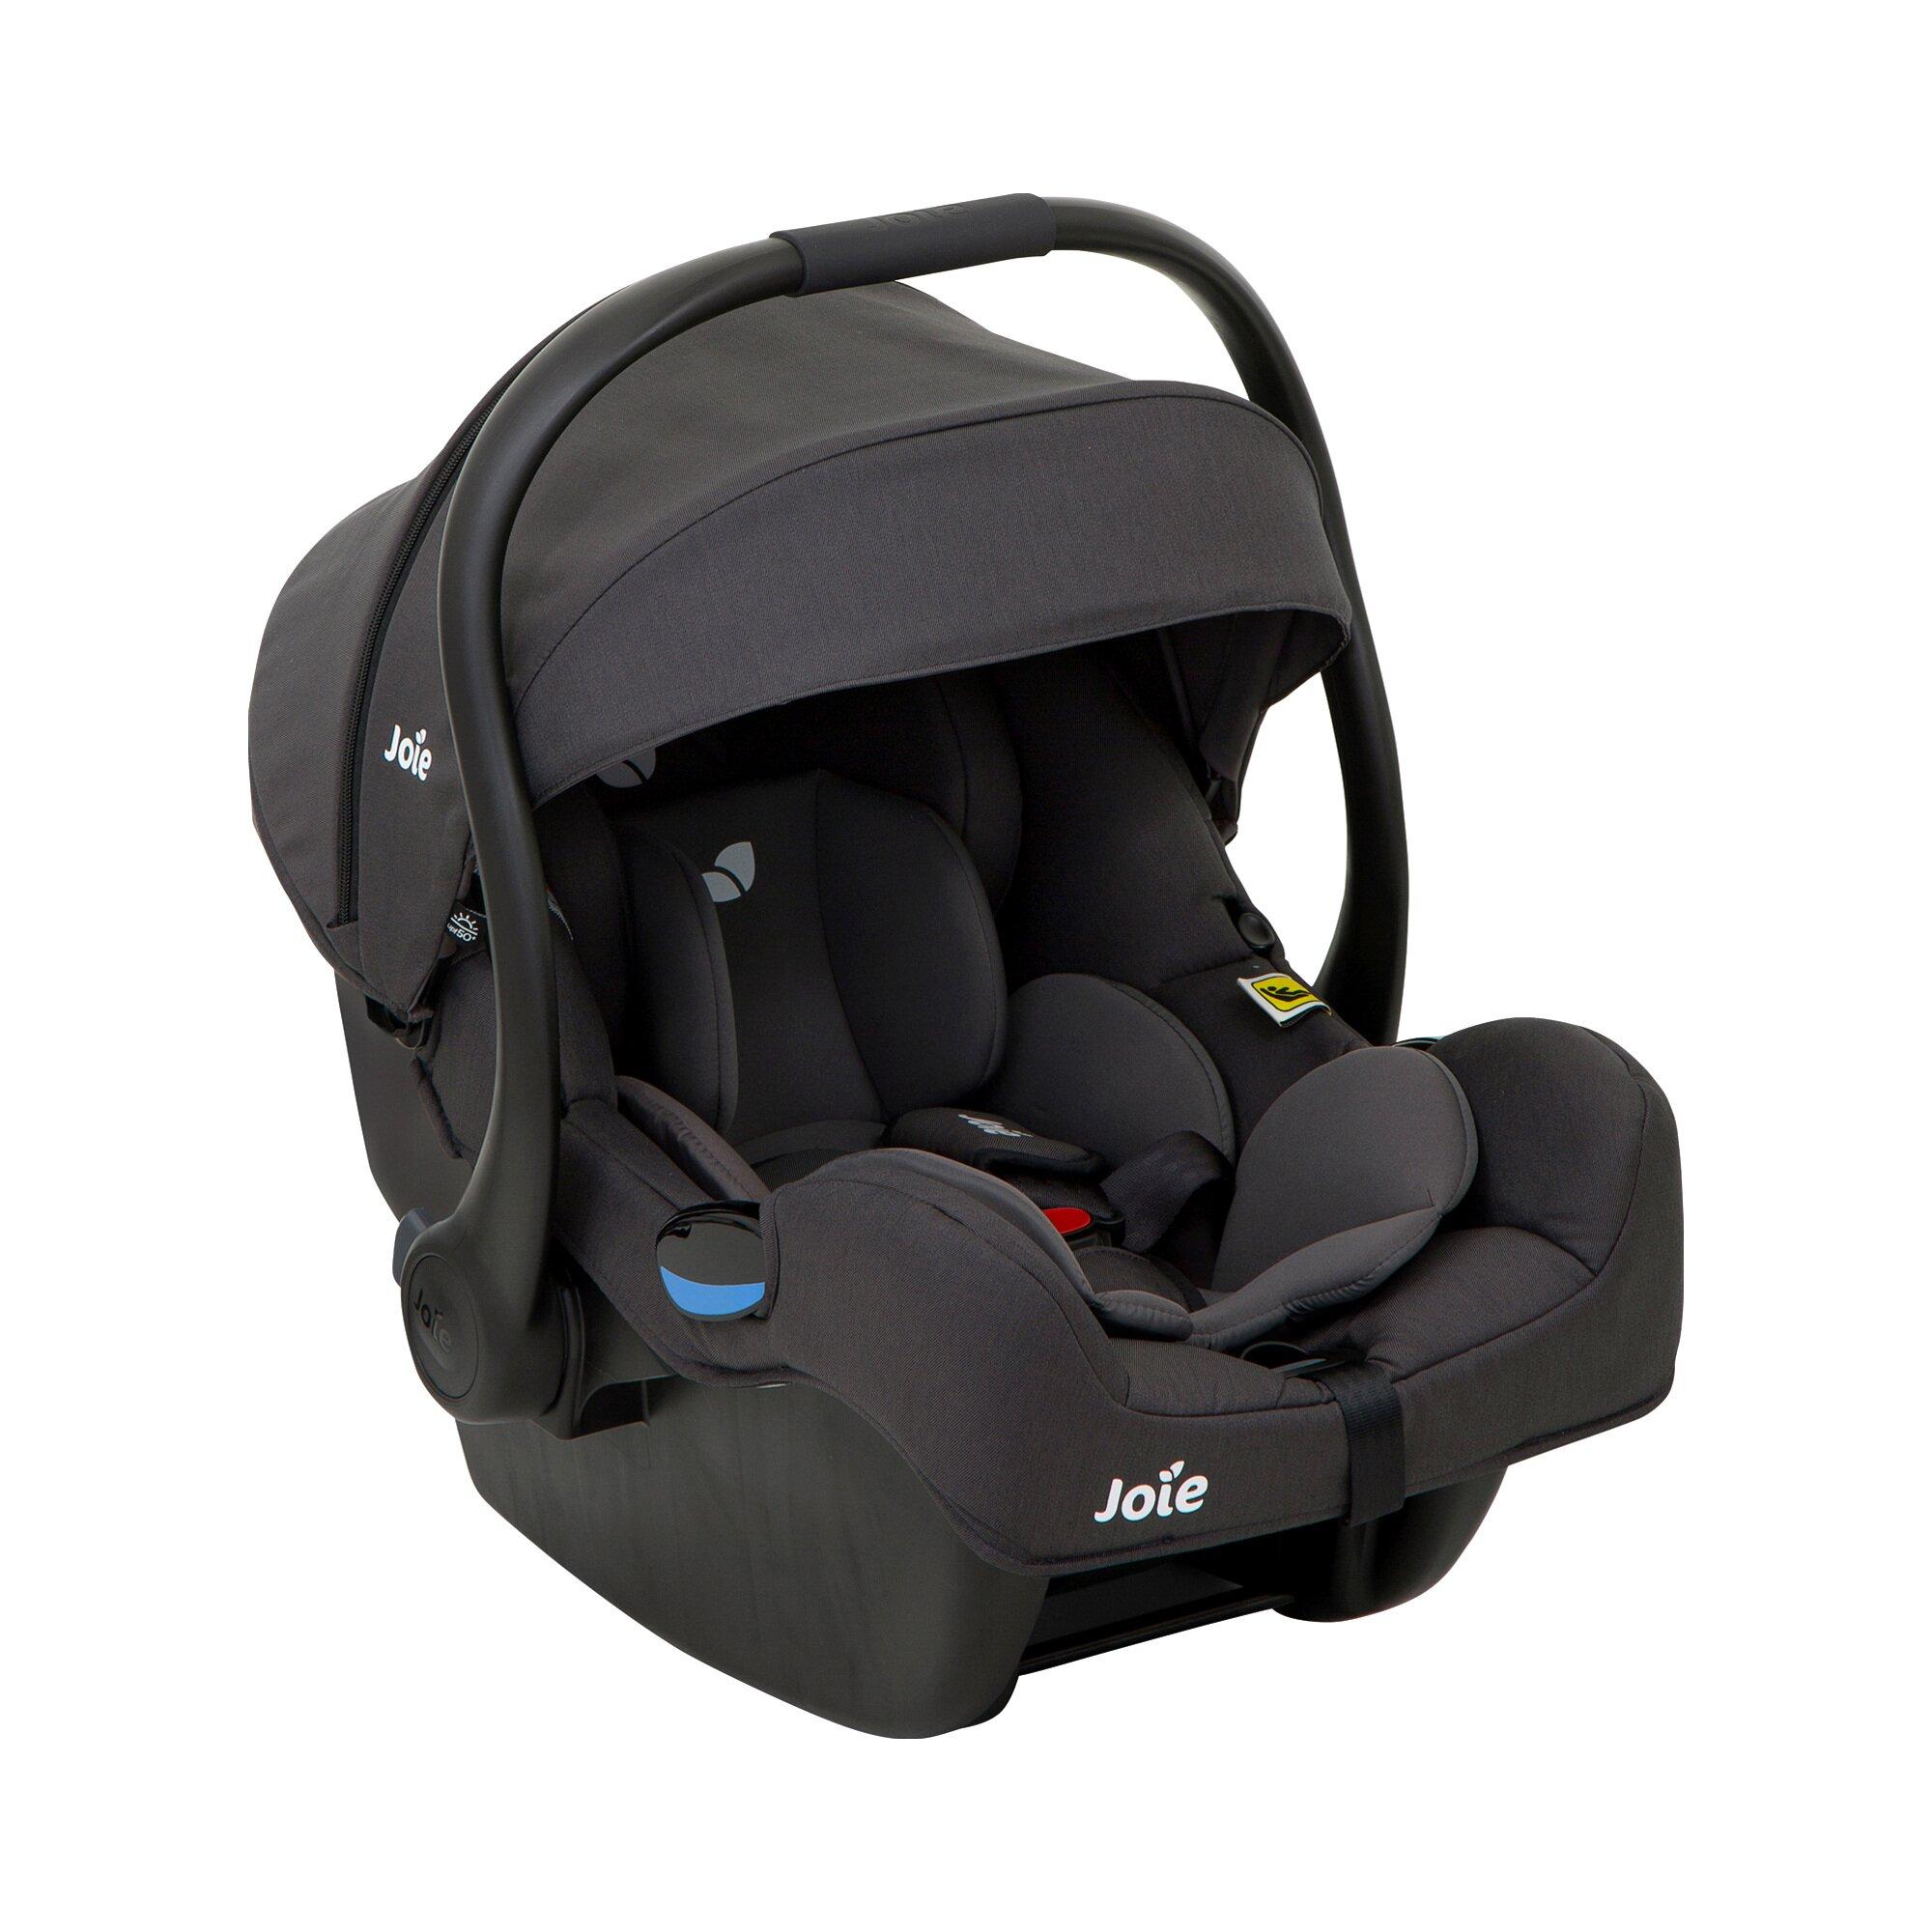 Joie i-Gemm™ i-Size Babyschale